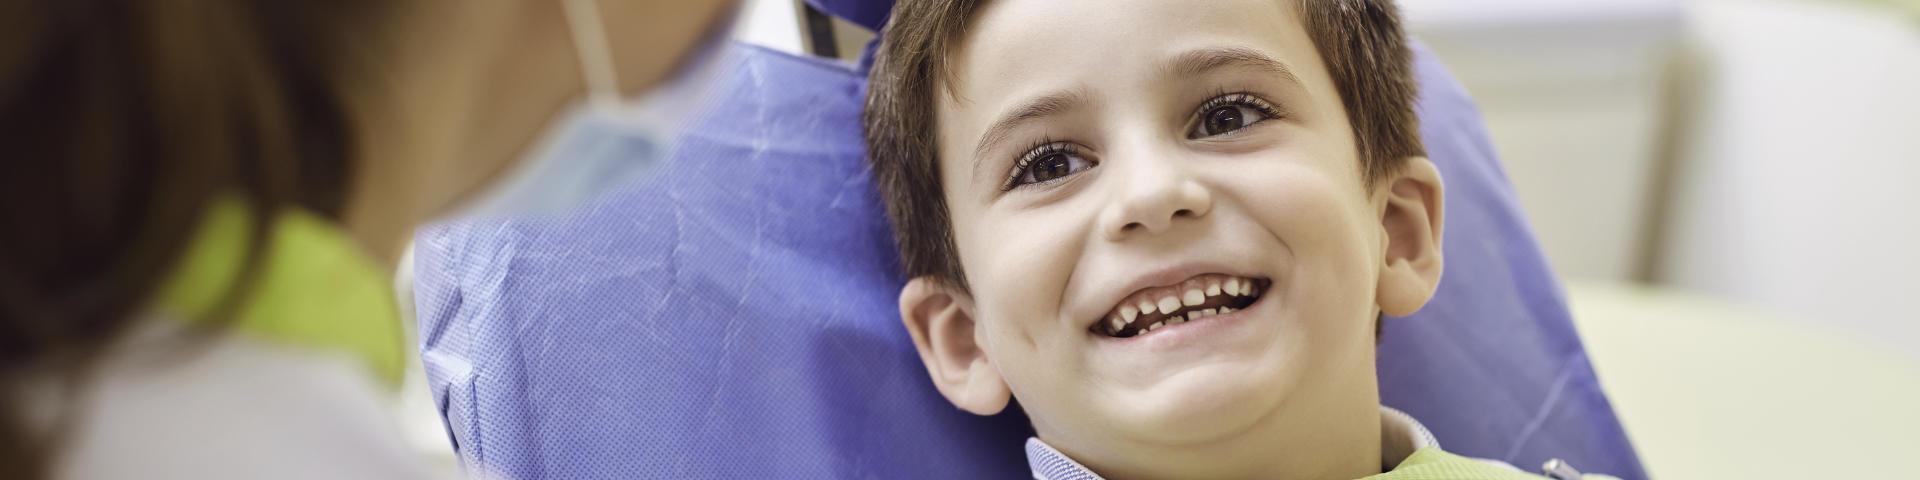 A joyful boy in a dental chair at Family Dentist in Rocky Hill, CT.